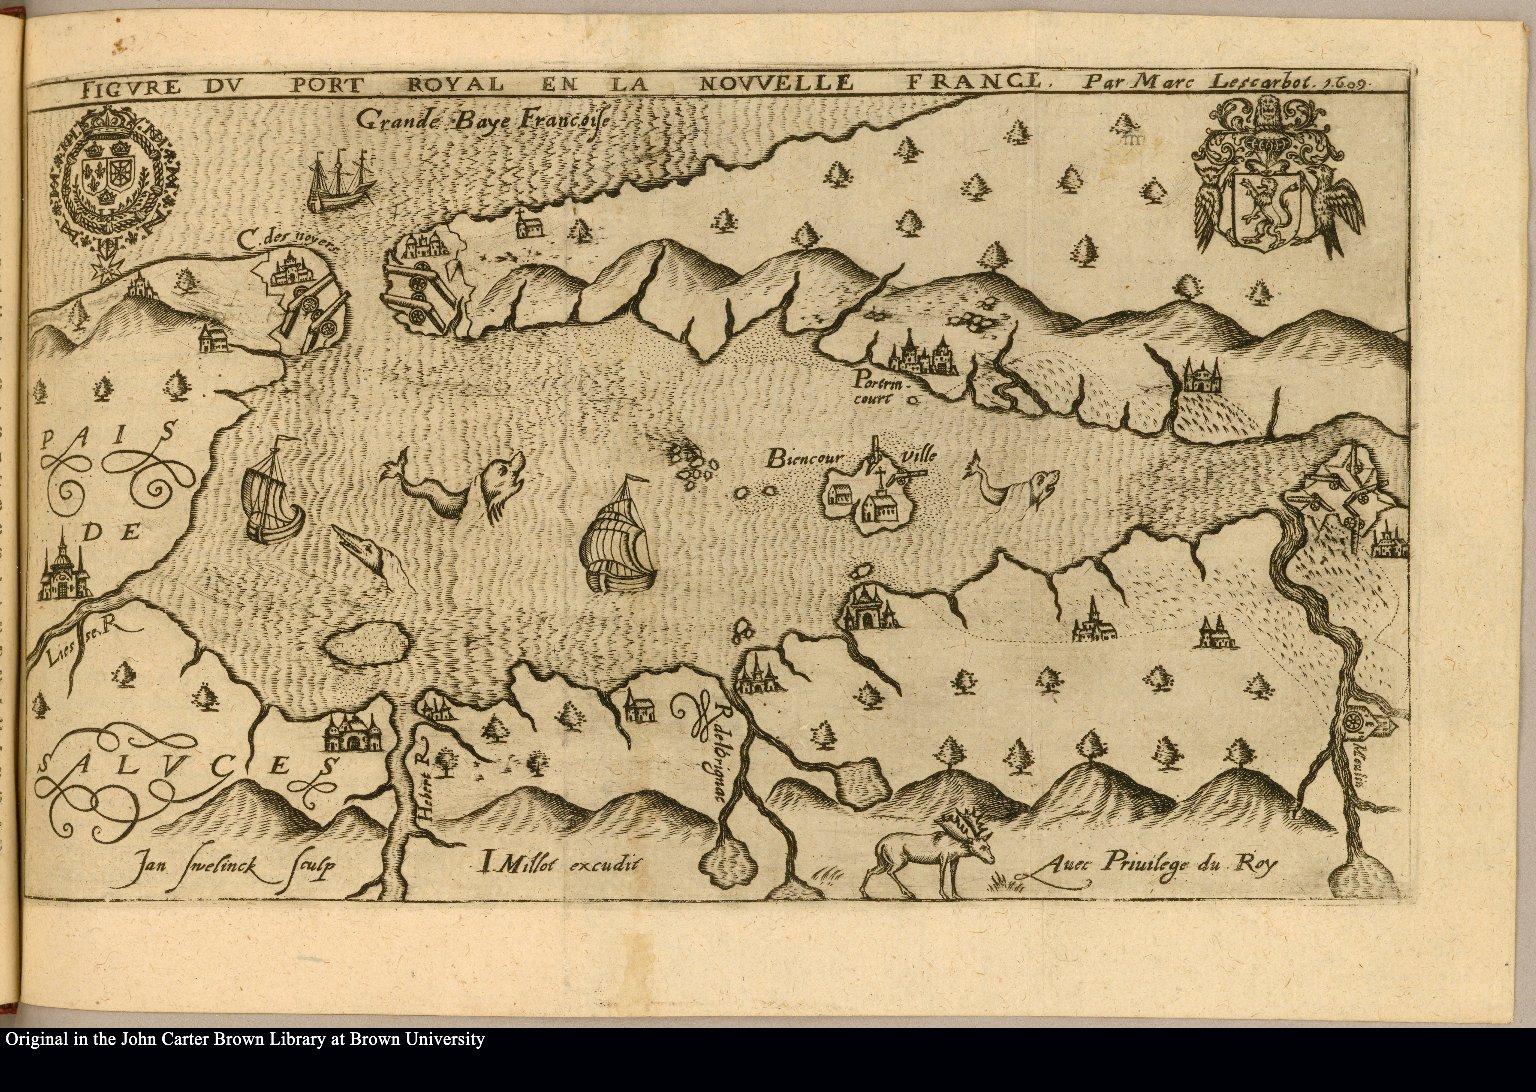 Figvre dv Port Royal en la Nouvvelle France